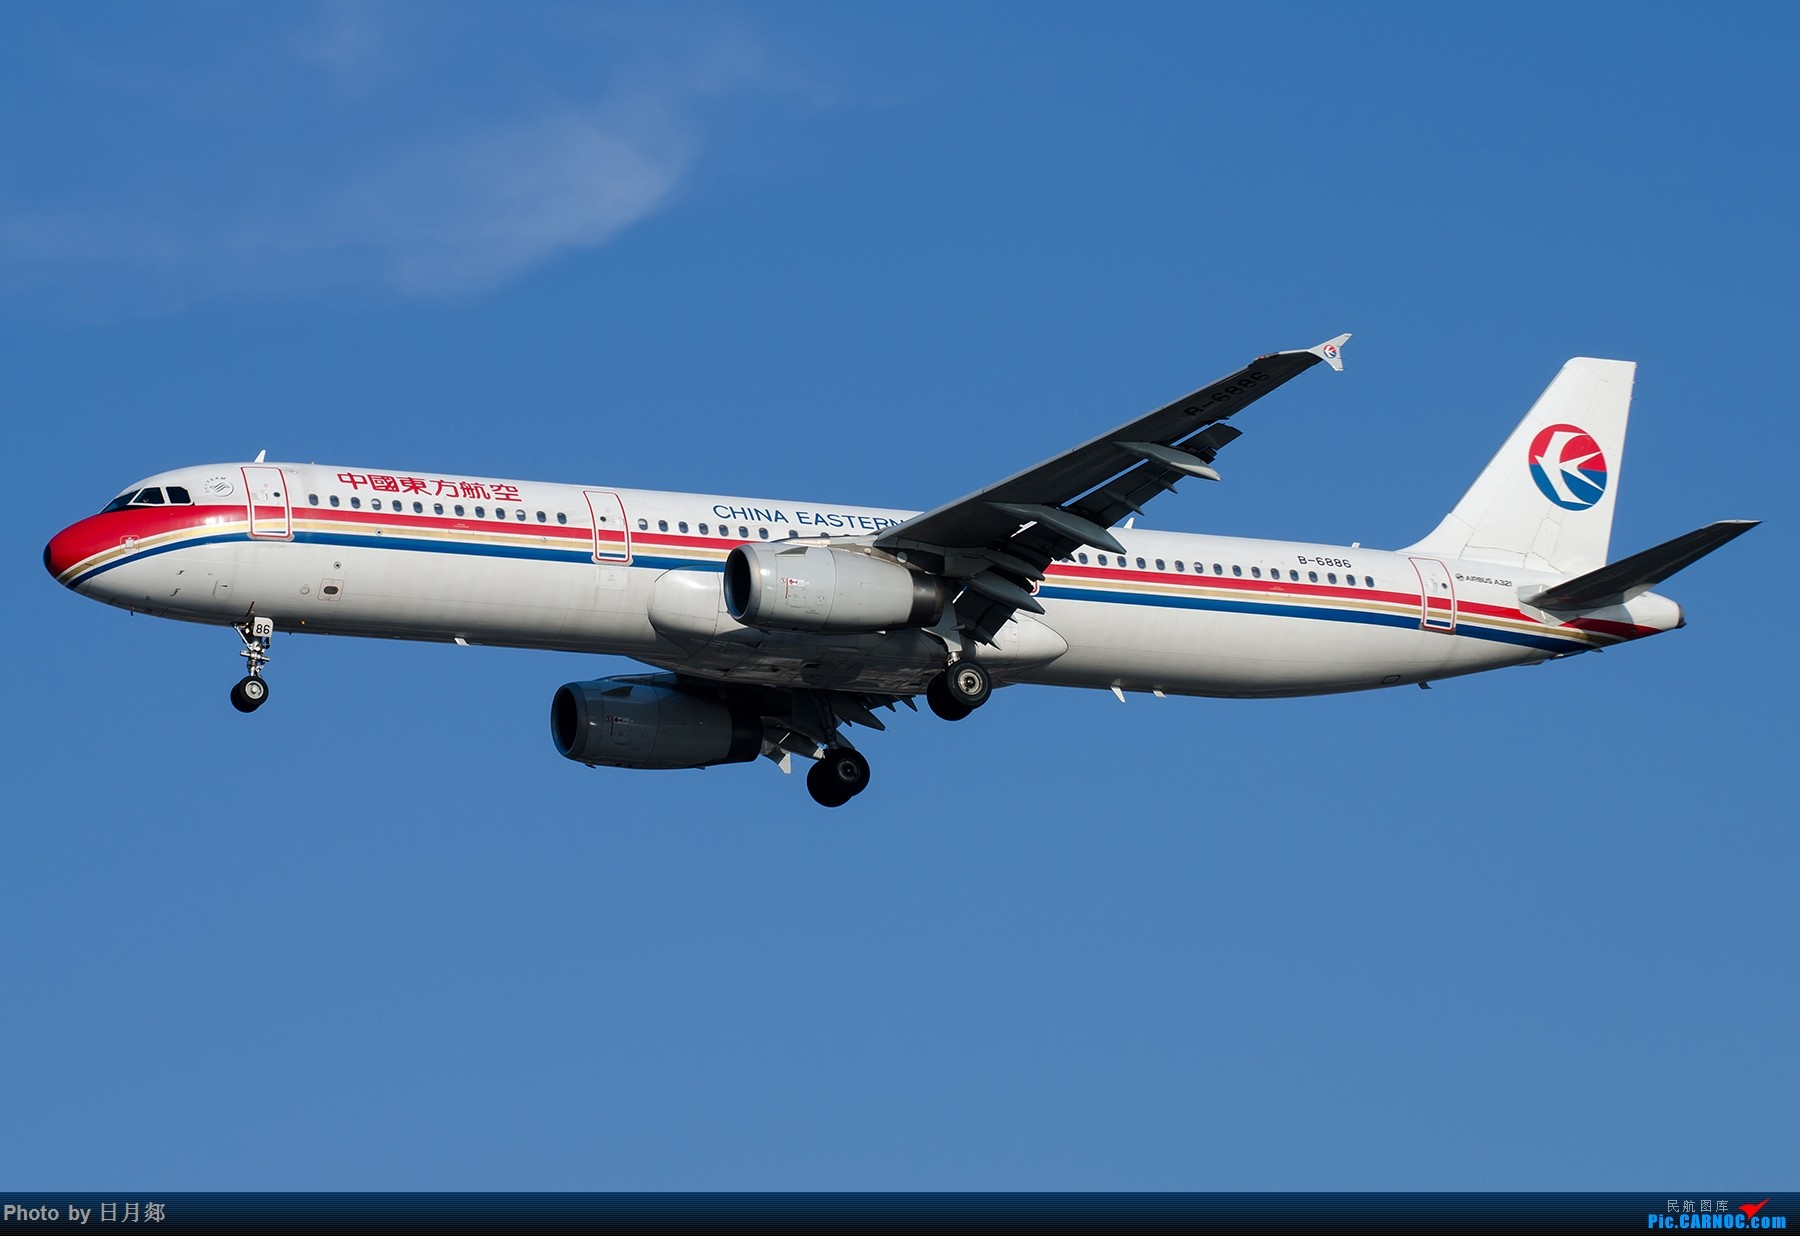 Re:[原创]【SHA拍机*1800大图】轻度污染来临前宝贵的蓝天,且拍且珍惜 AIRBUS A321-200 B-6886 中国上海虹桥国际机场